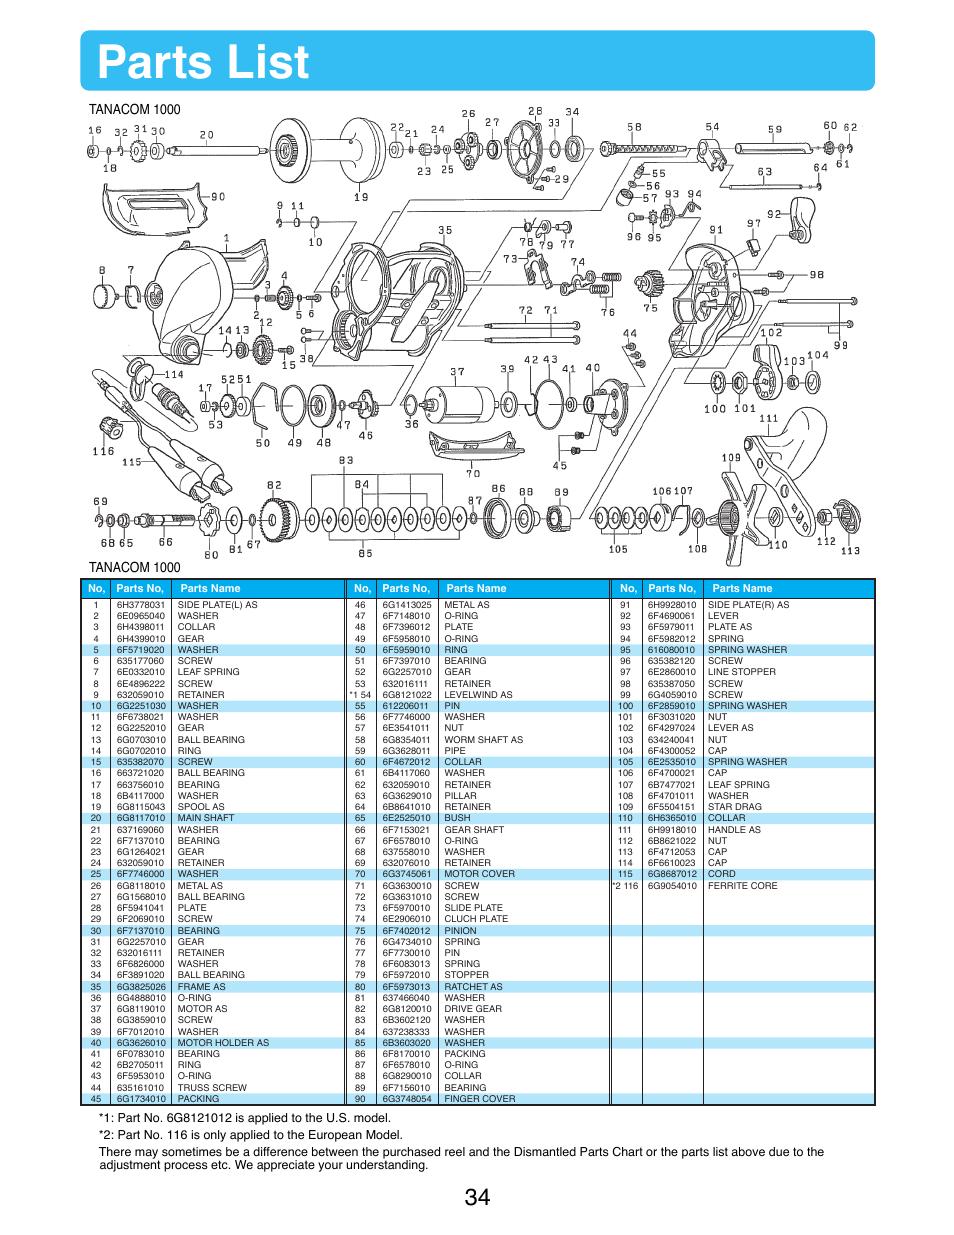 Parts list, Tanacom 1000 | Daiwa TANACOM 1000 User Manual ... on